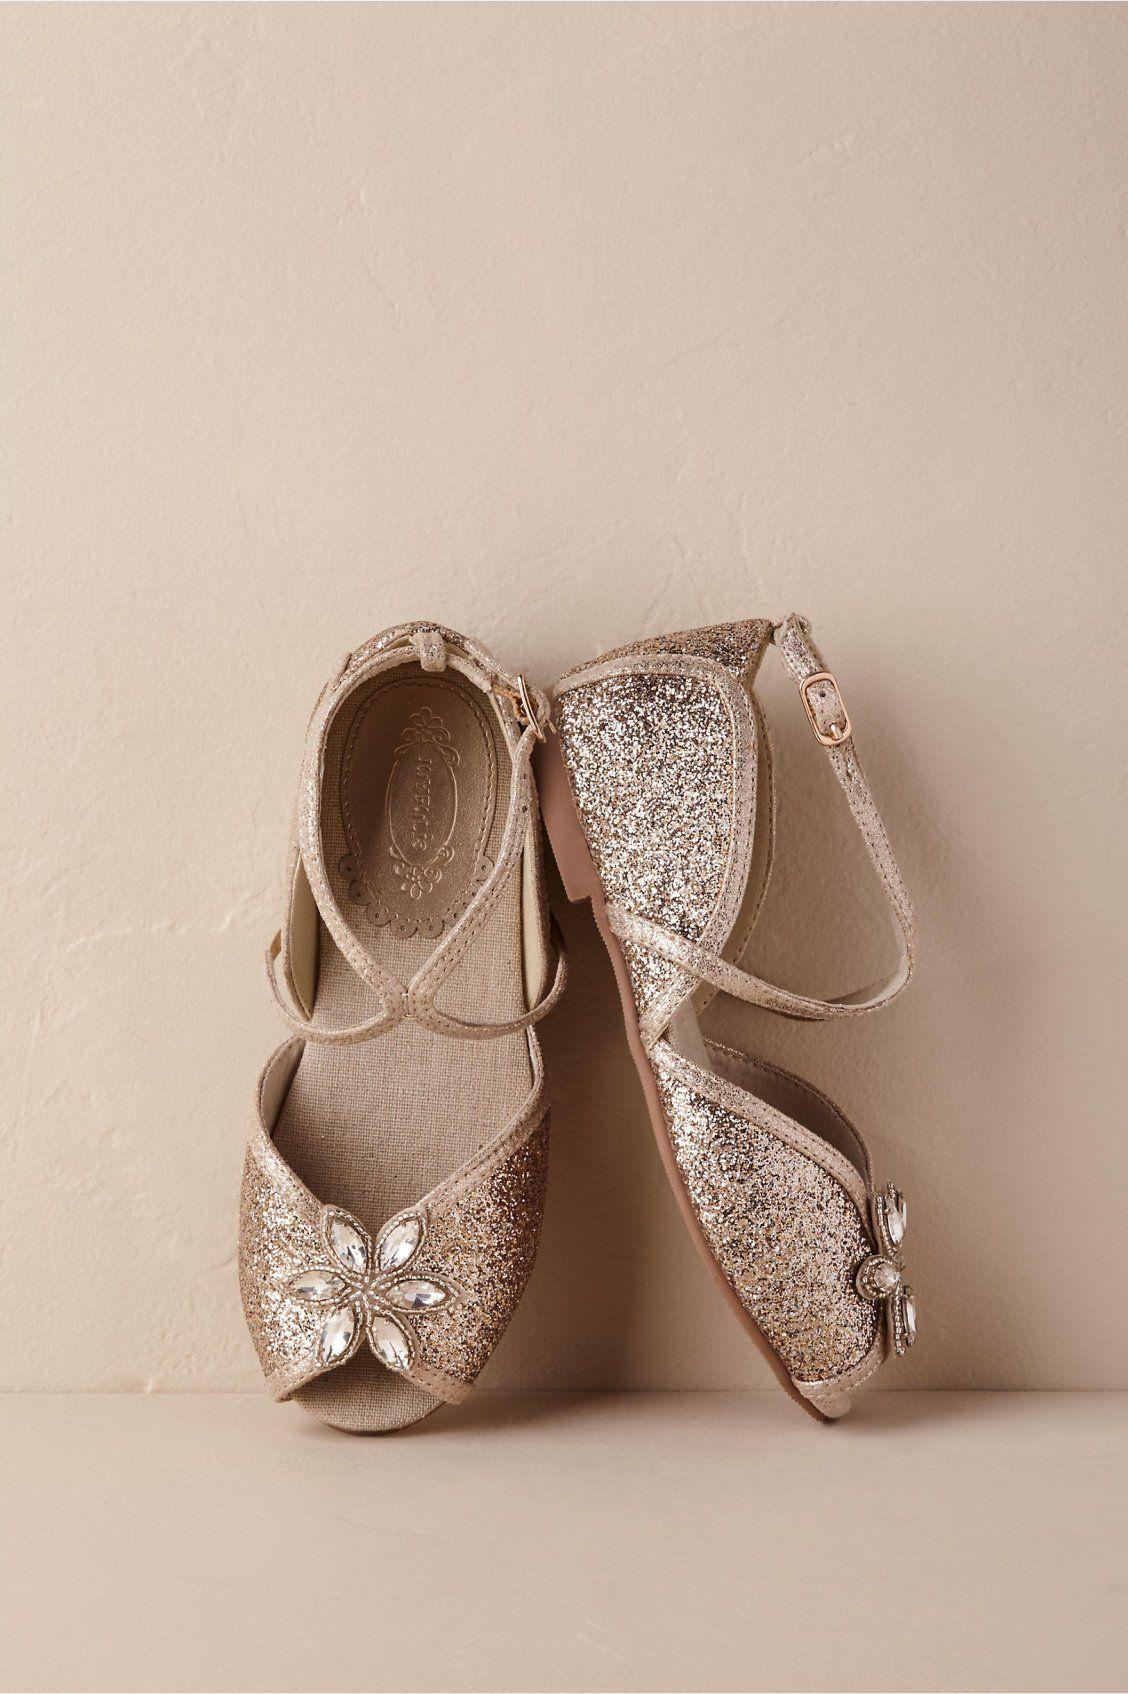 Aubree Glitter Flats from BHLDN Flower girl shoes gold